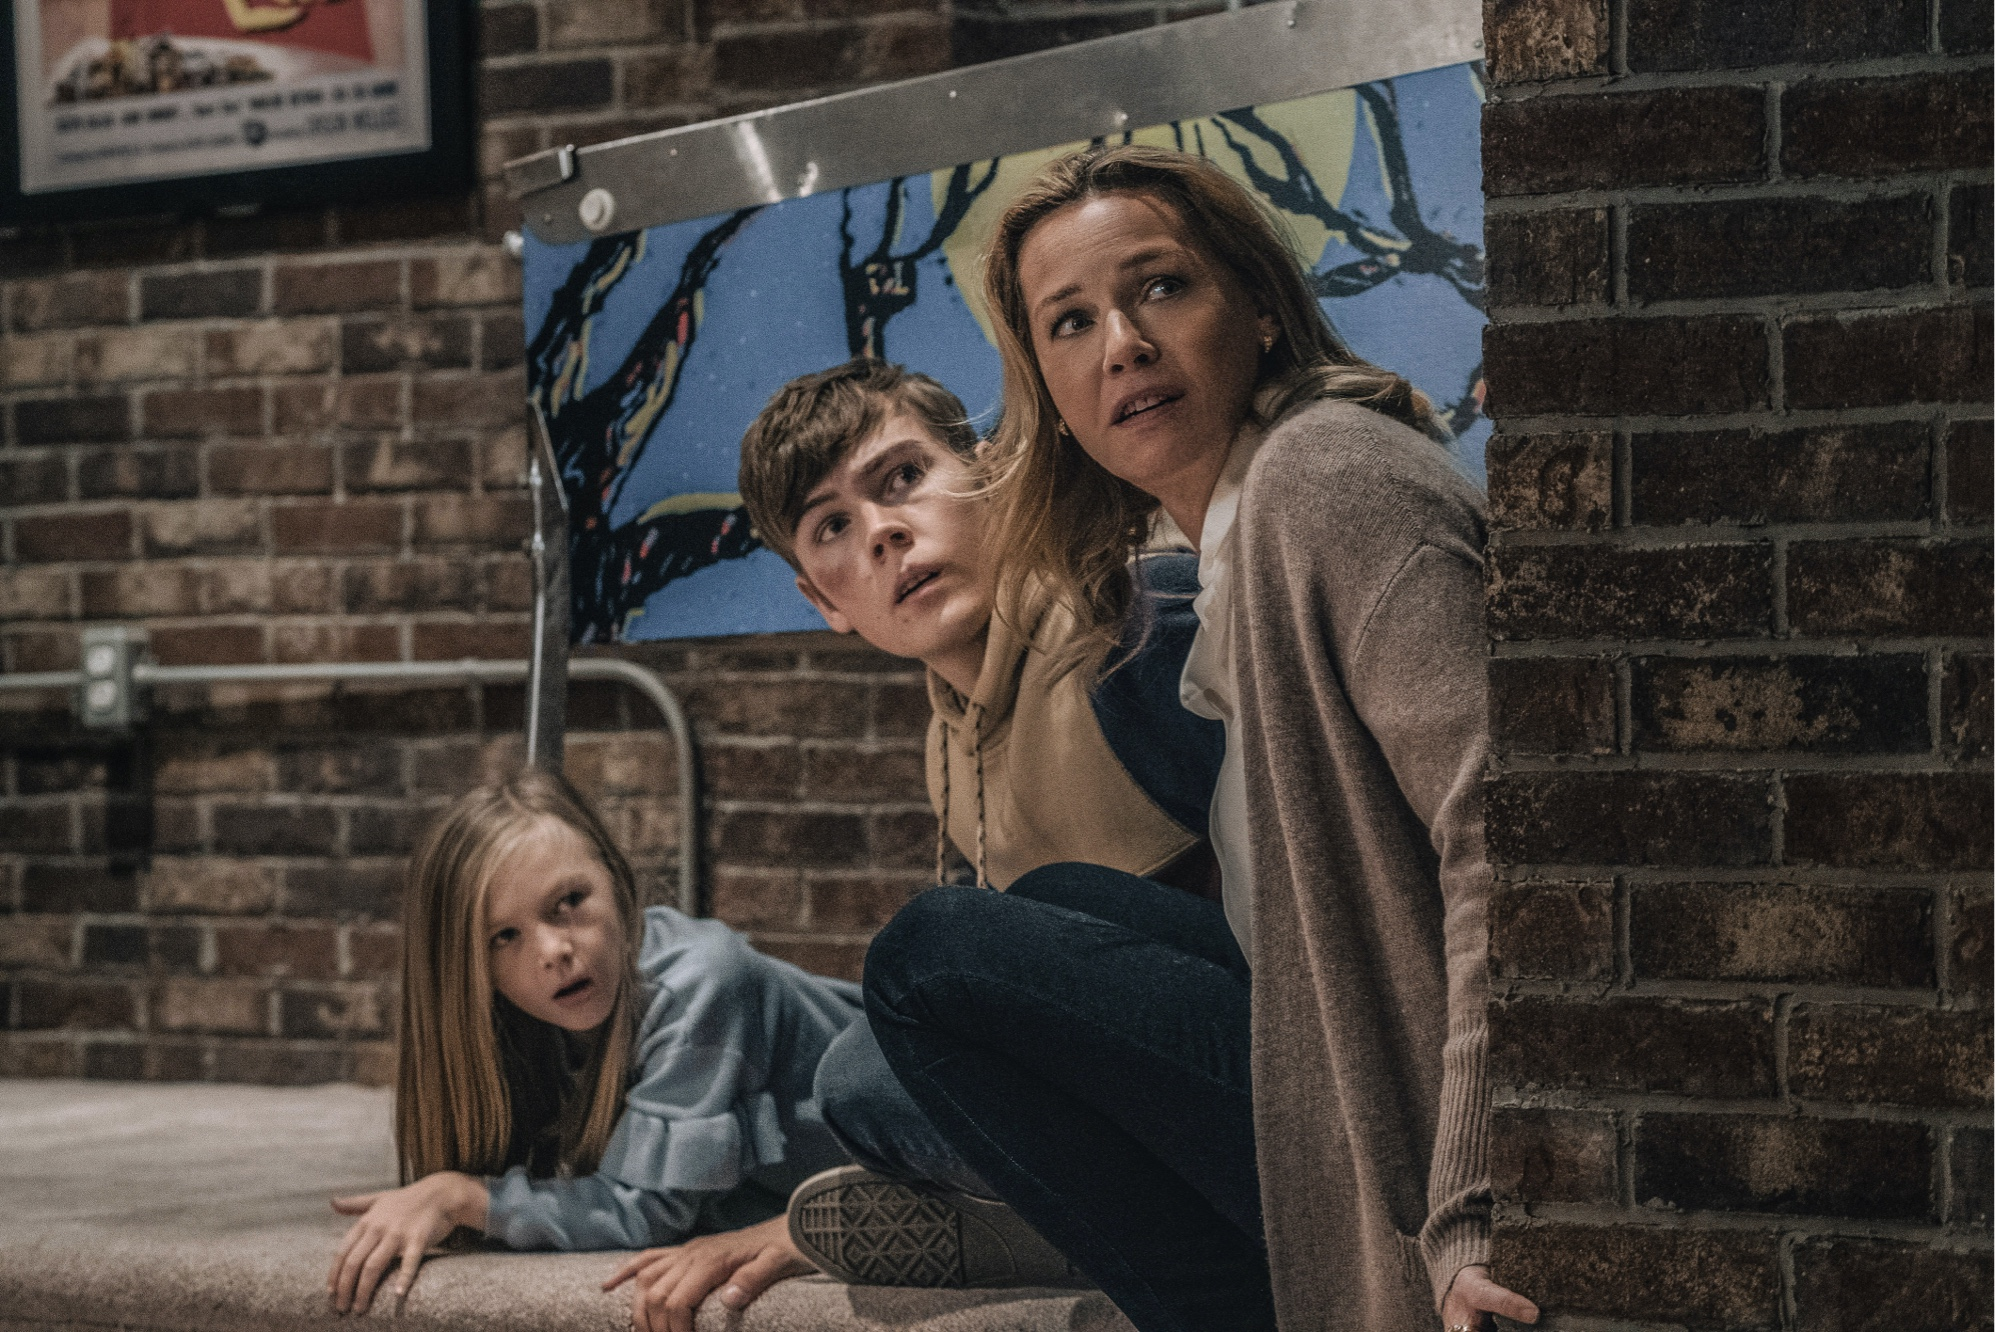 Watch Nobody (2021 Movie) | On Demand Now